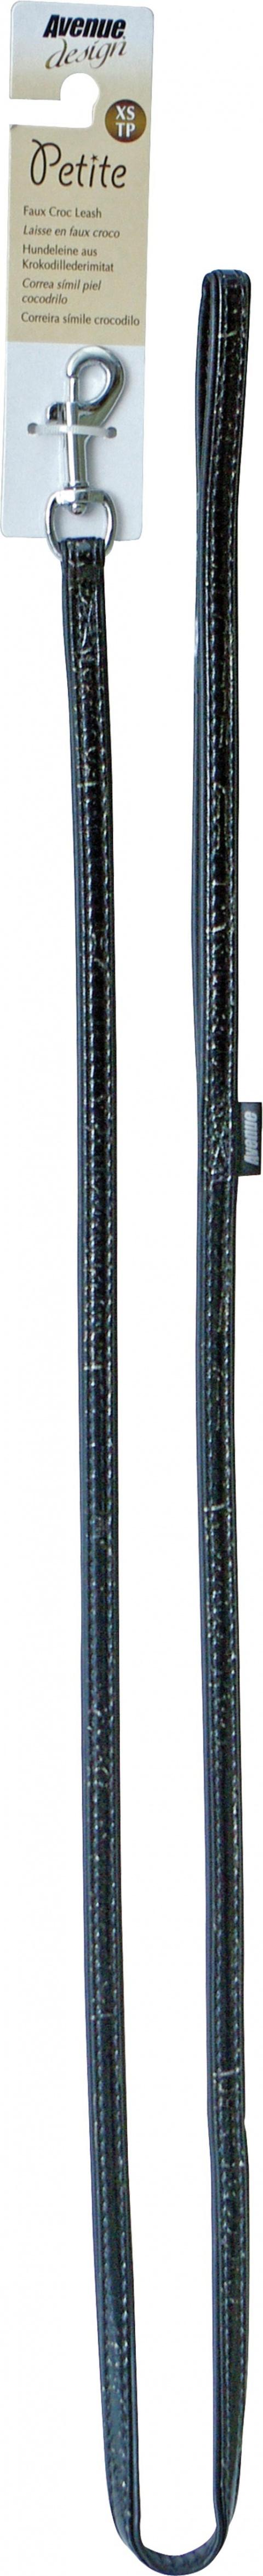 Vodítko AVENUE Petite černé 122cm